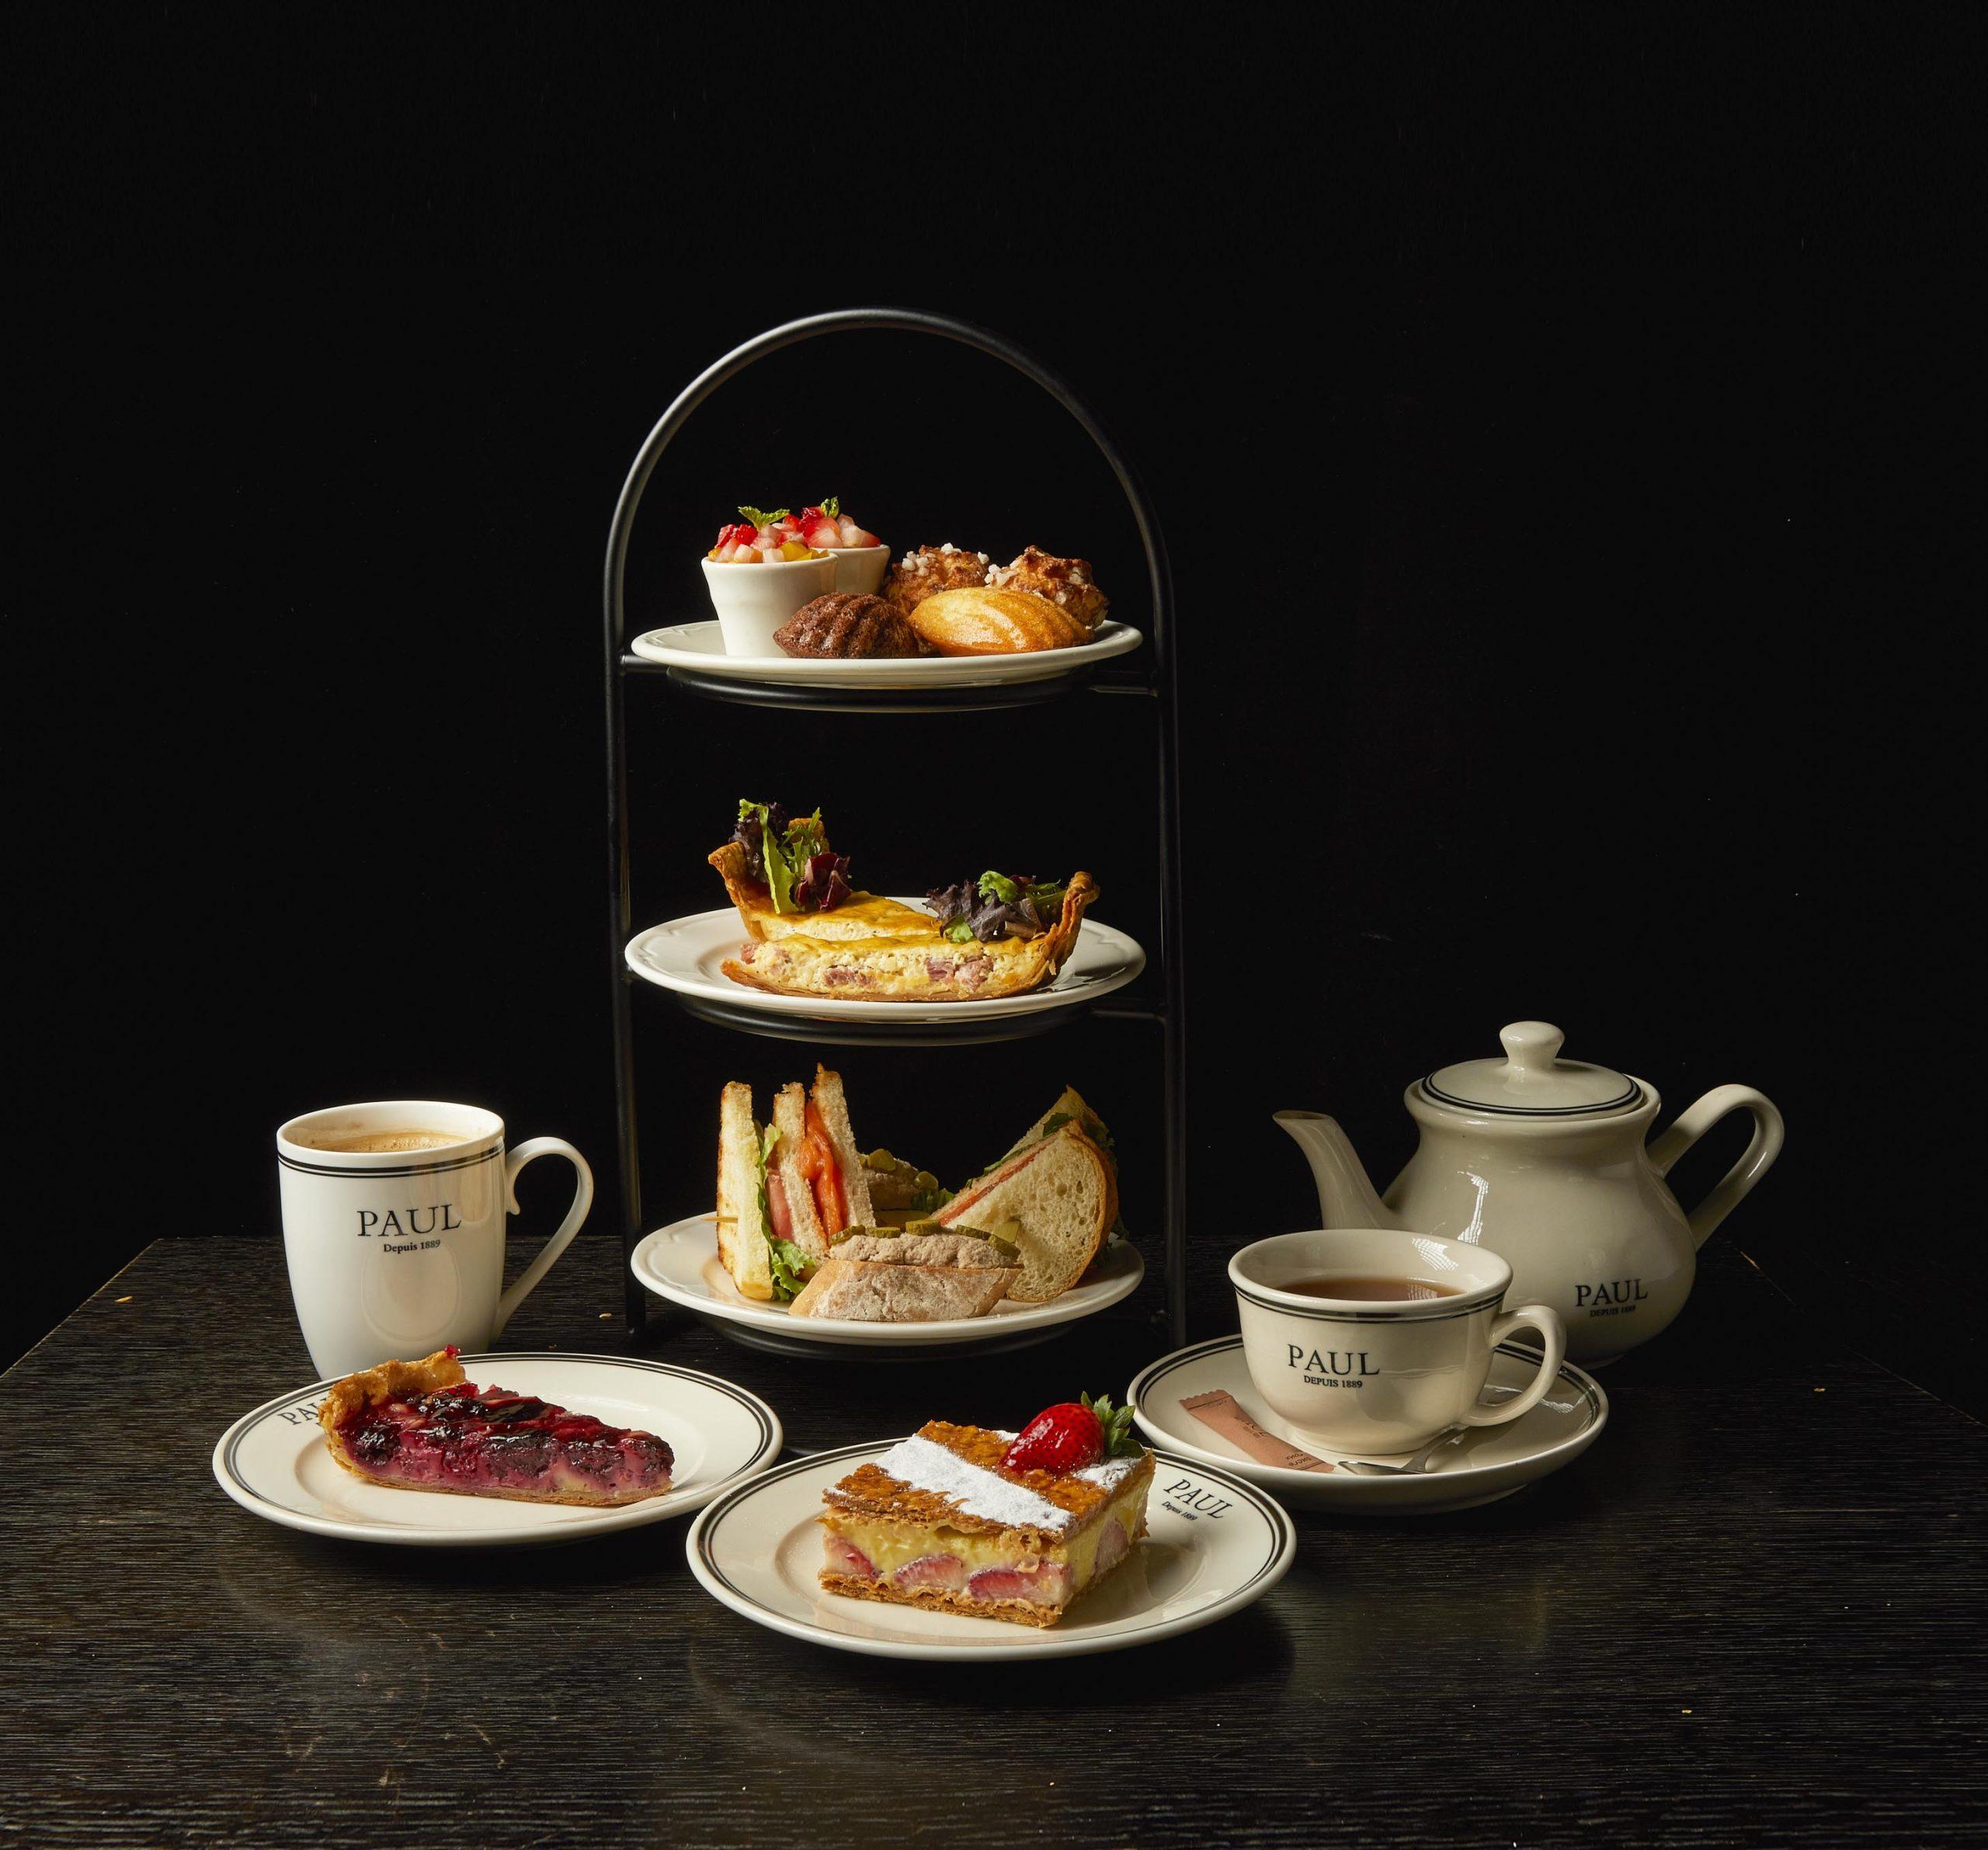 下午茶 Afternoon tea